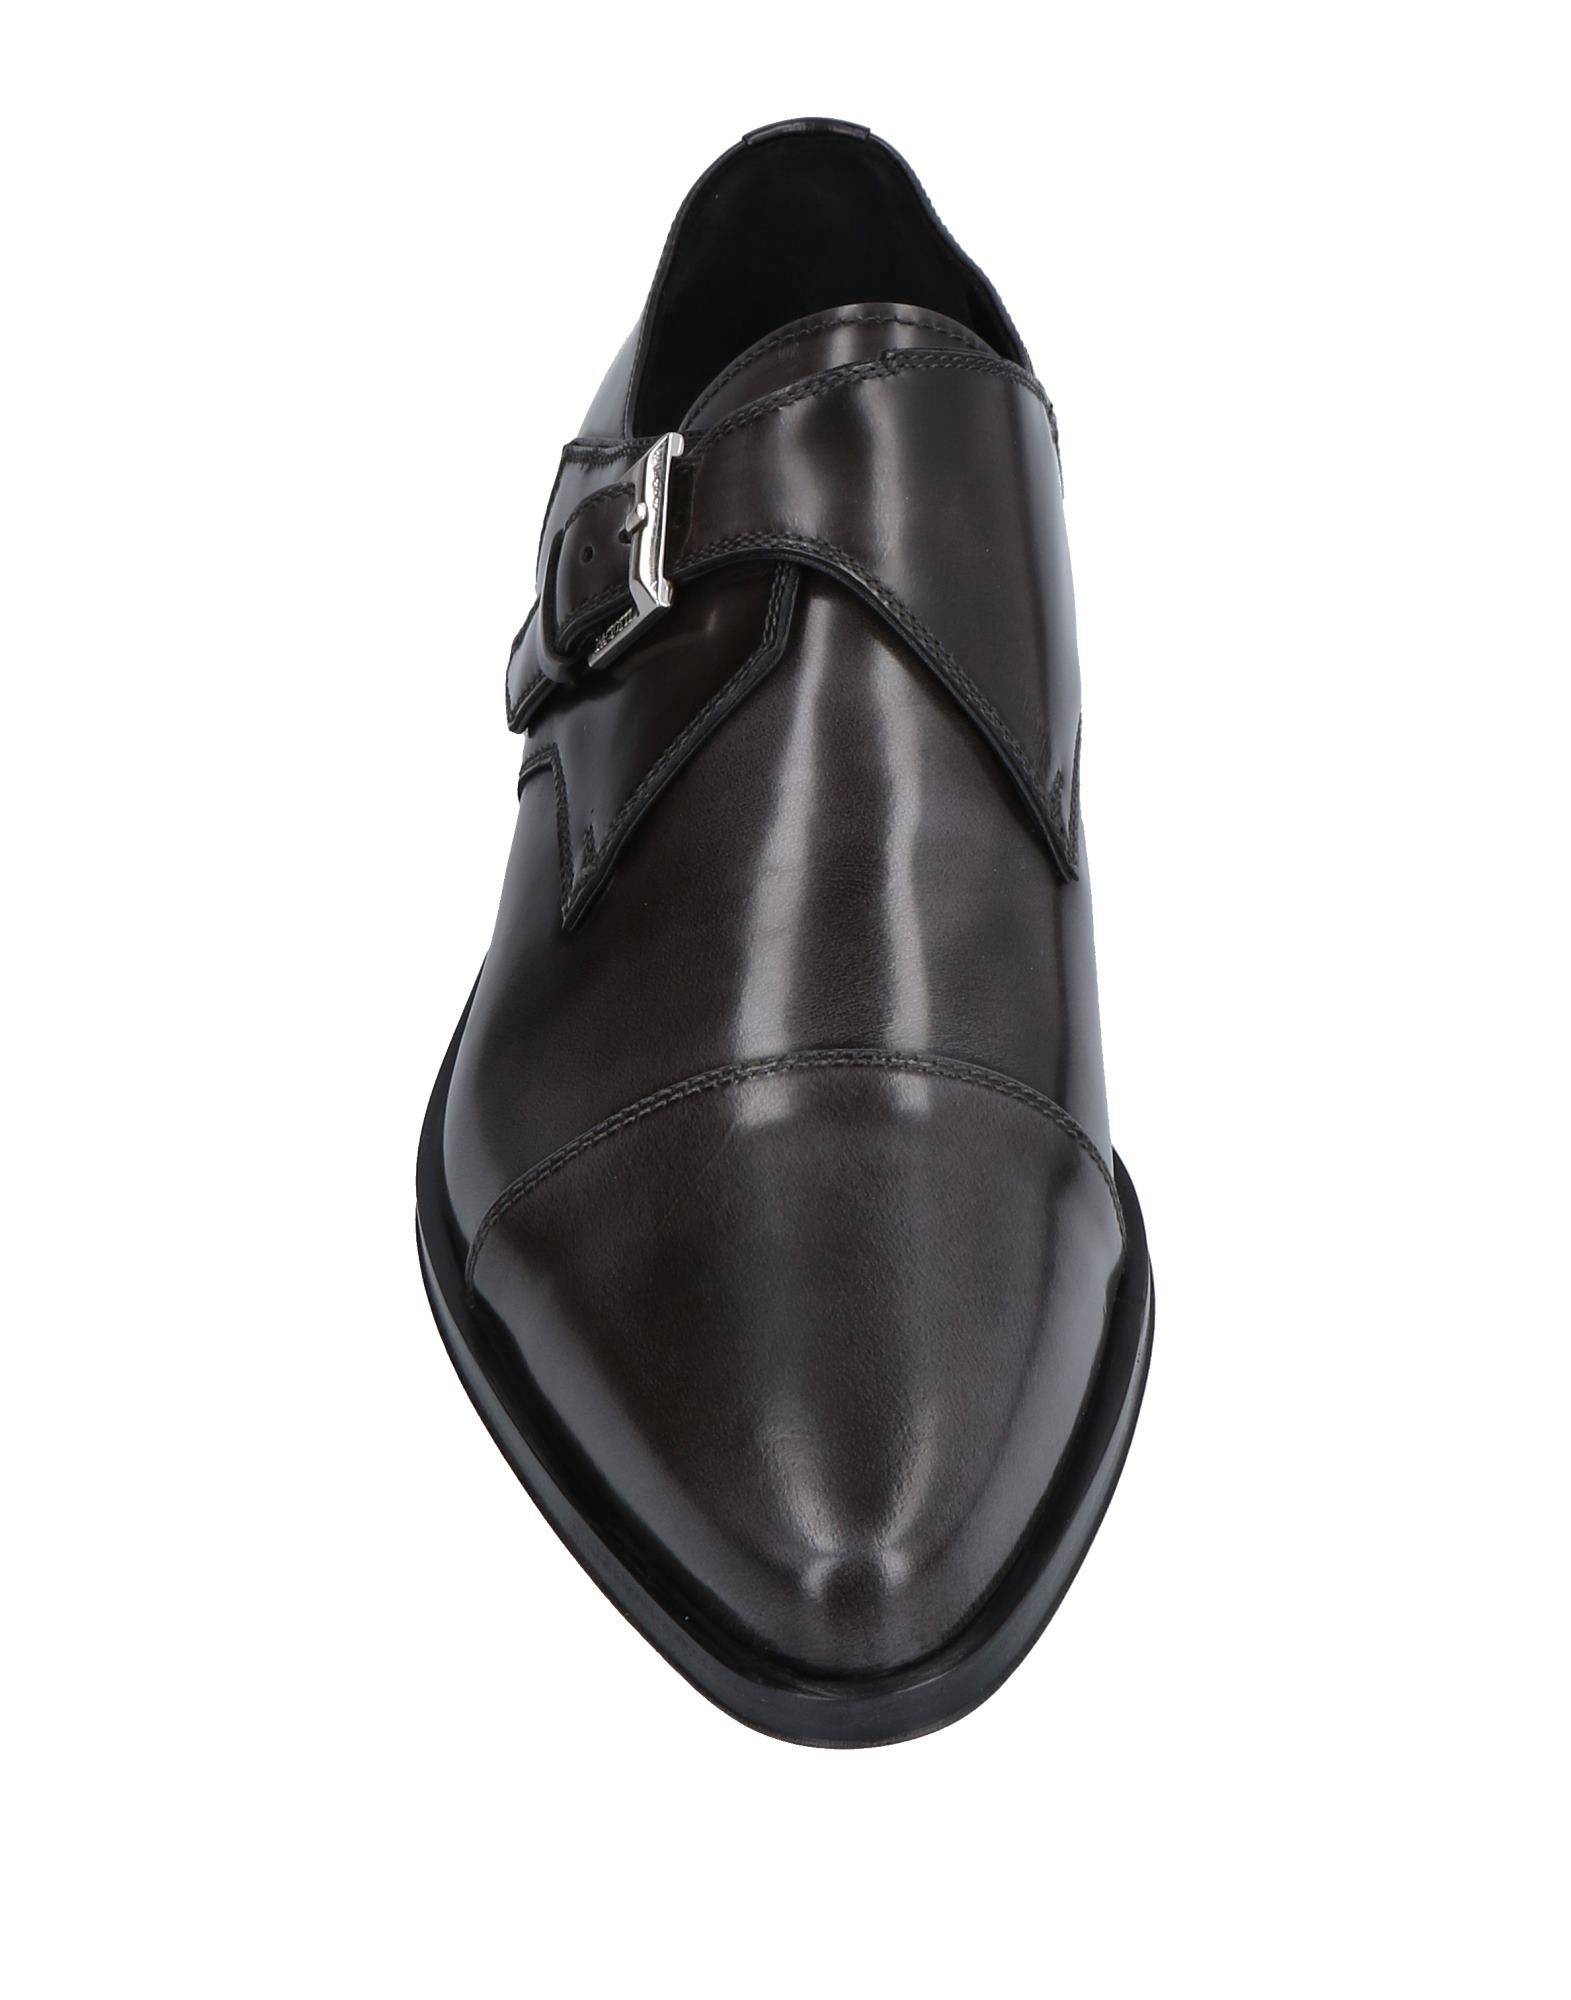 Cesare Paciotti Gute Mokassins Herren  11506639RM Gute Paciotti Qualität beliebte Schuhe 453c16